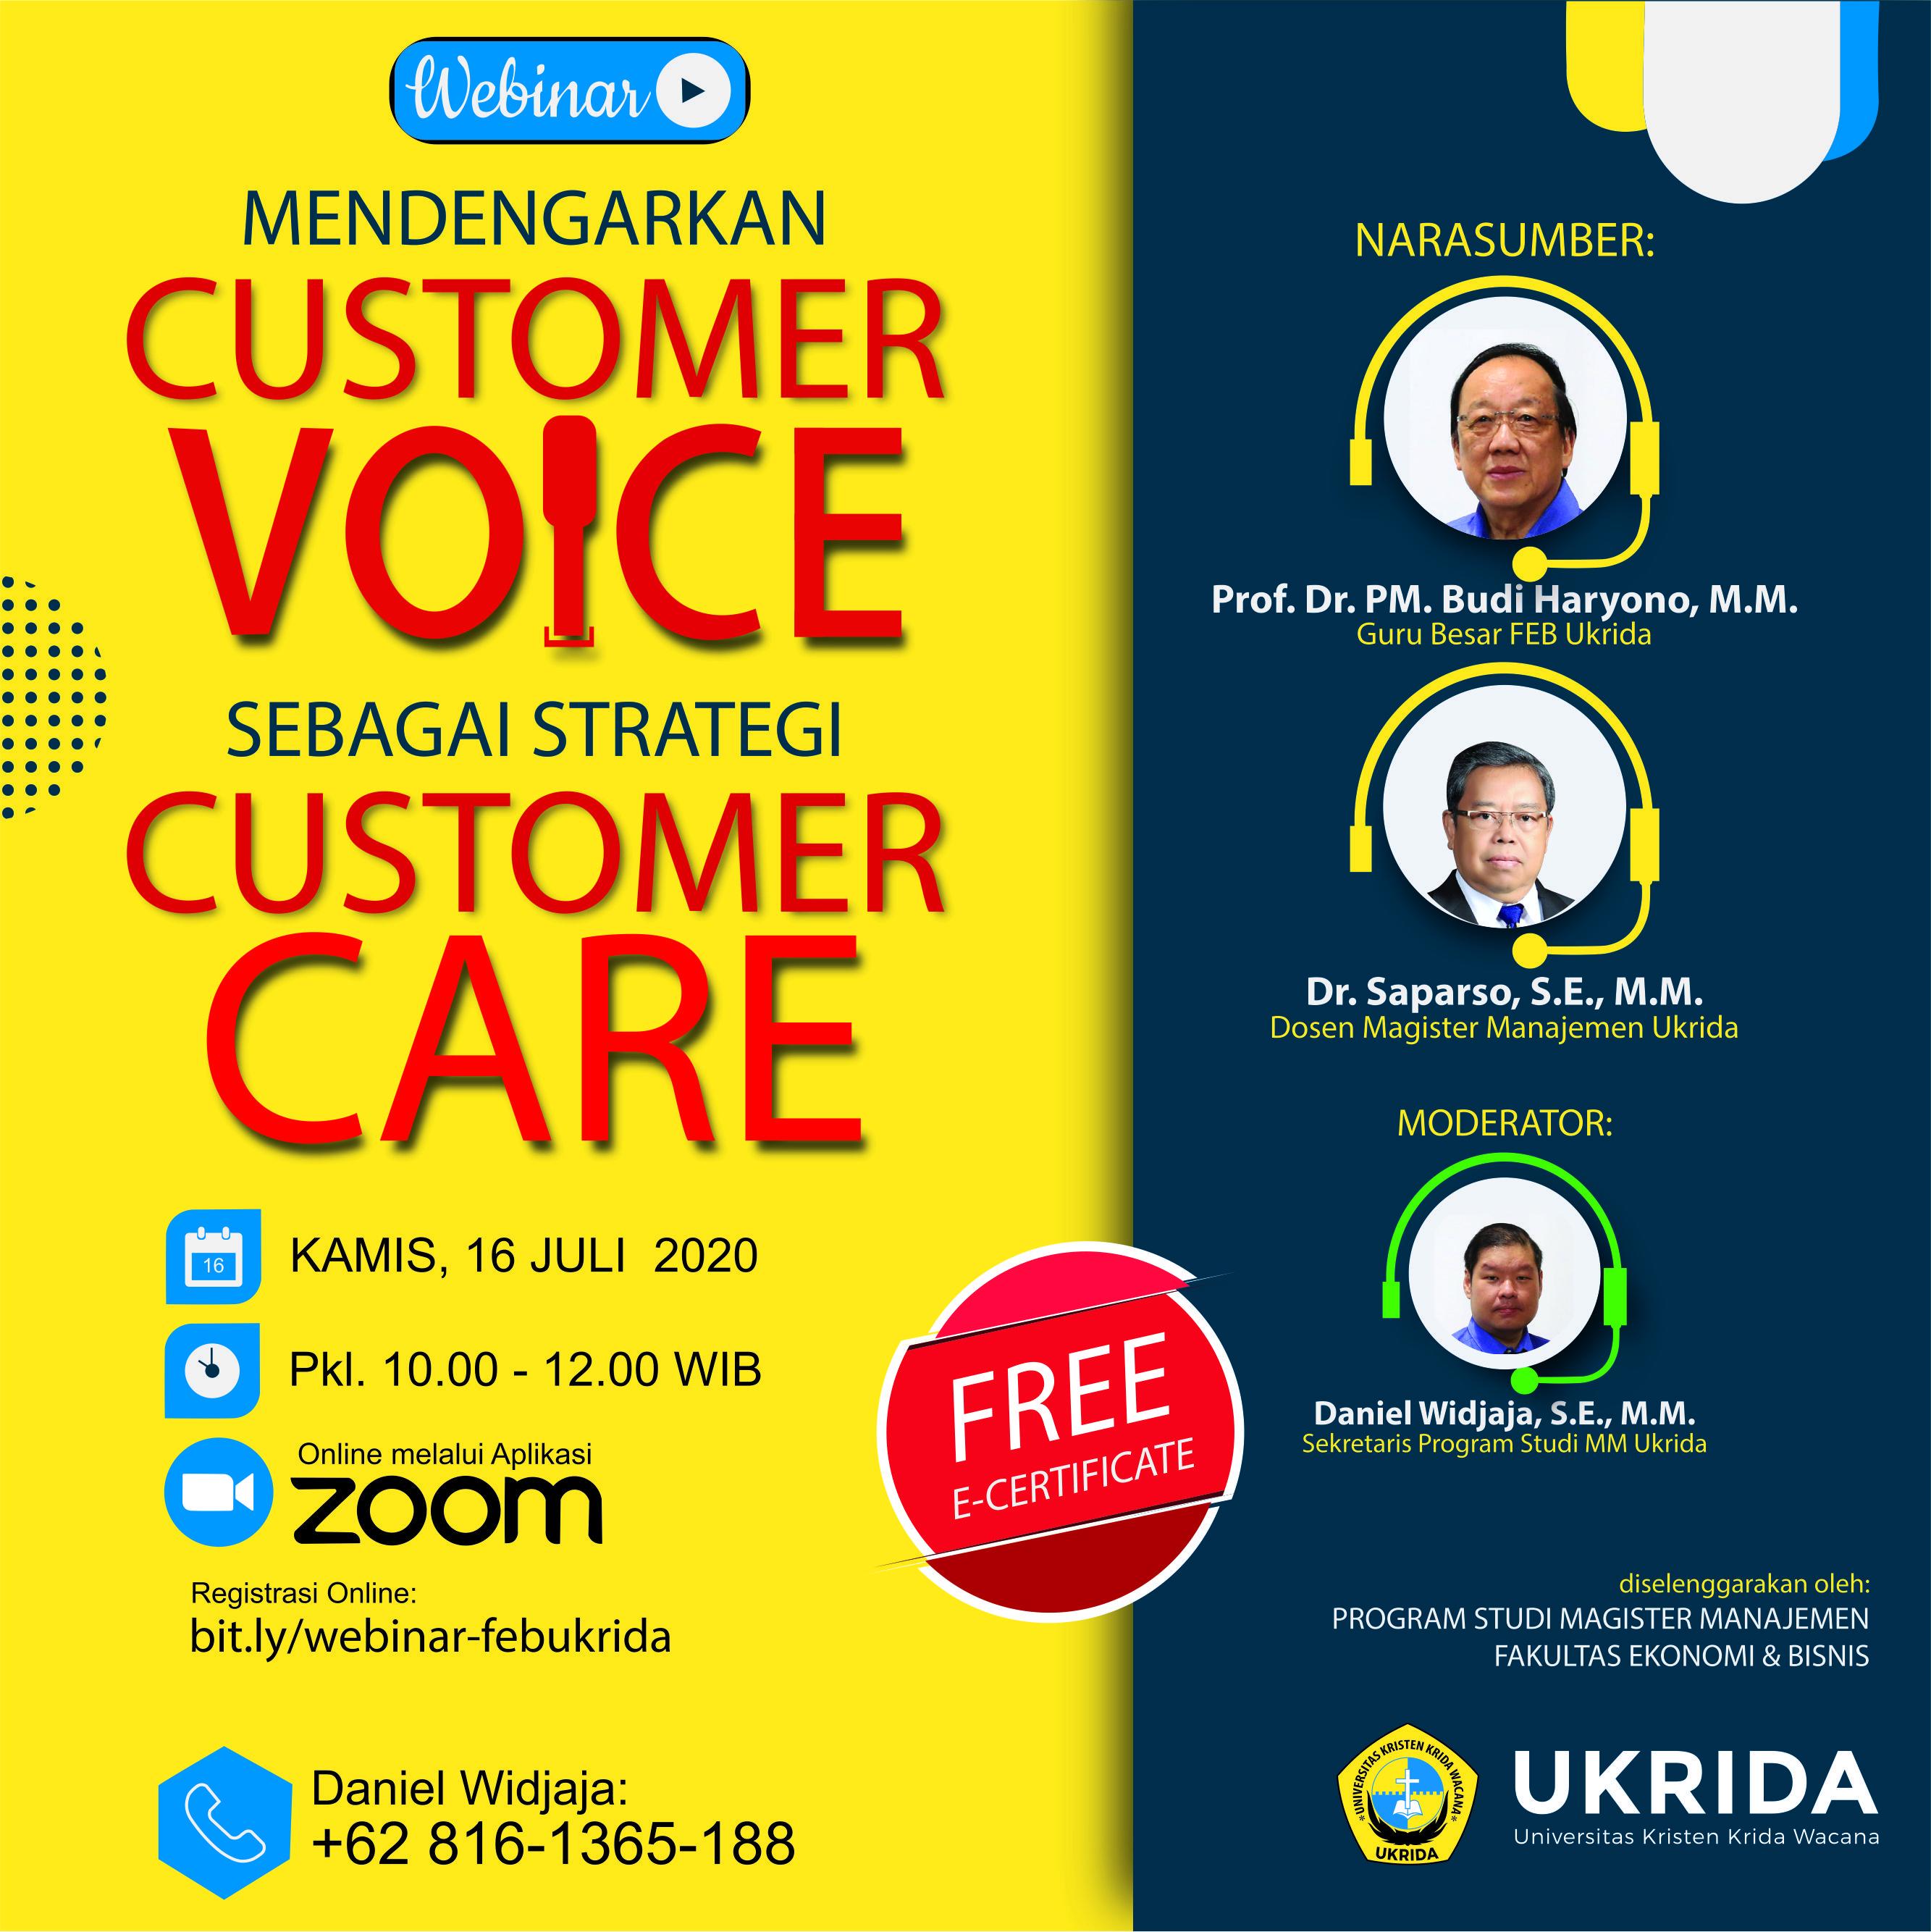 Webinar Mendengarkan Customer Voice Sebagai Strategi Customer Care Ukrida Ac Id